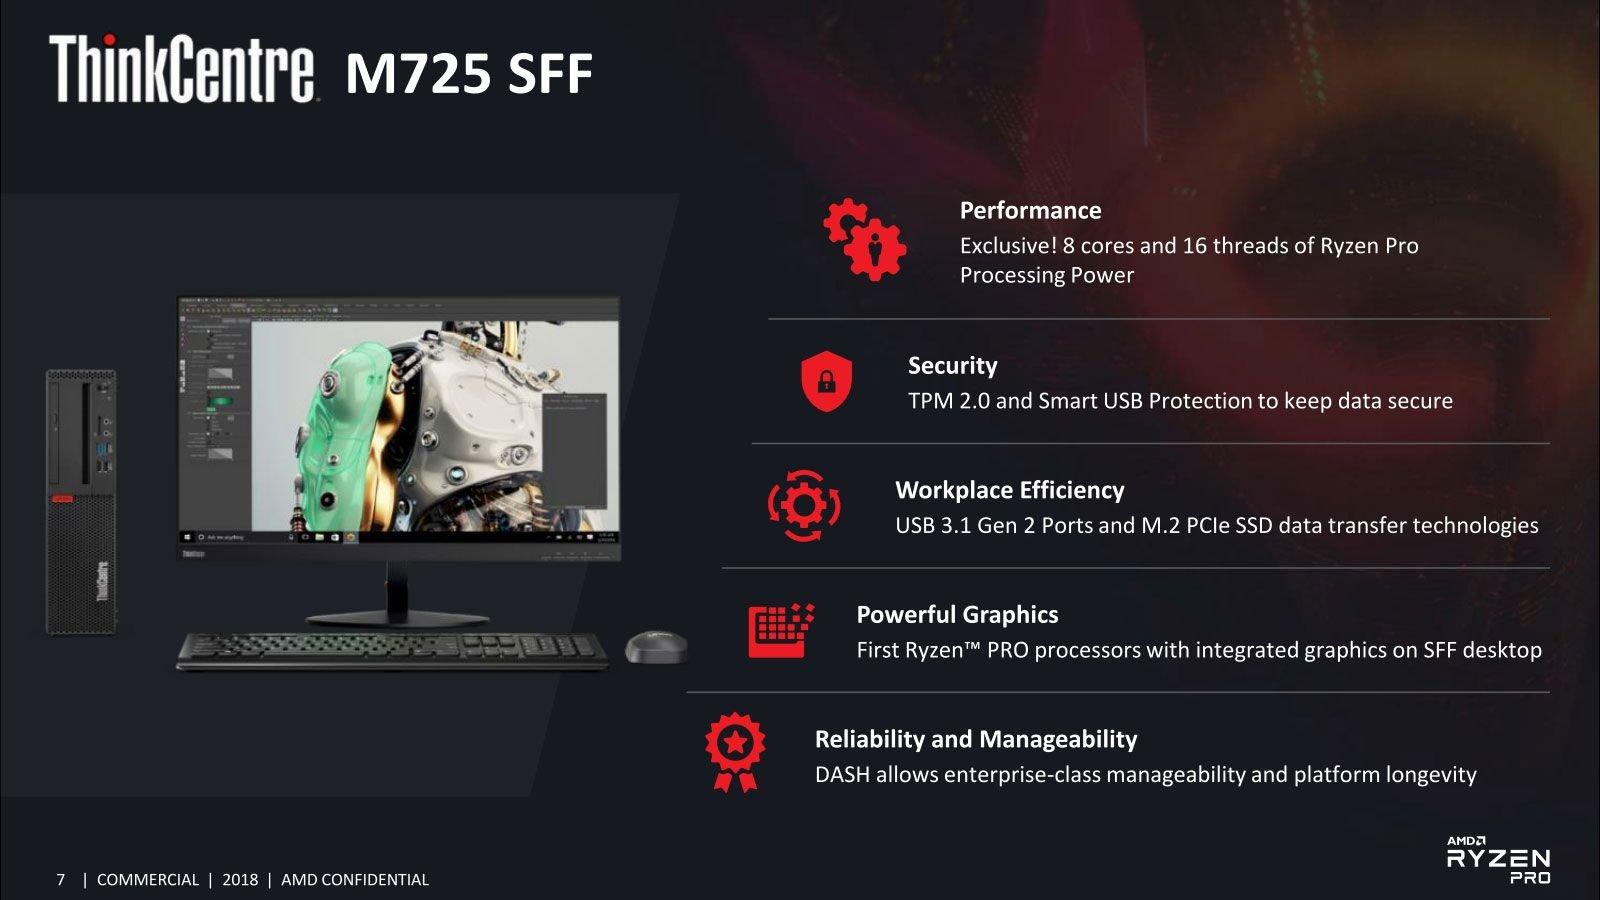 ThinkCentre M725 SFF